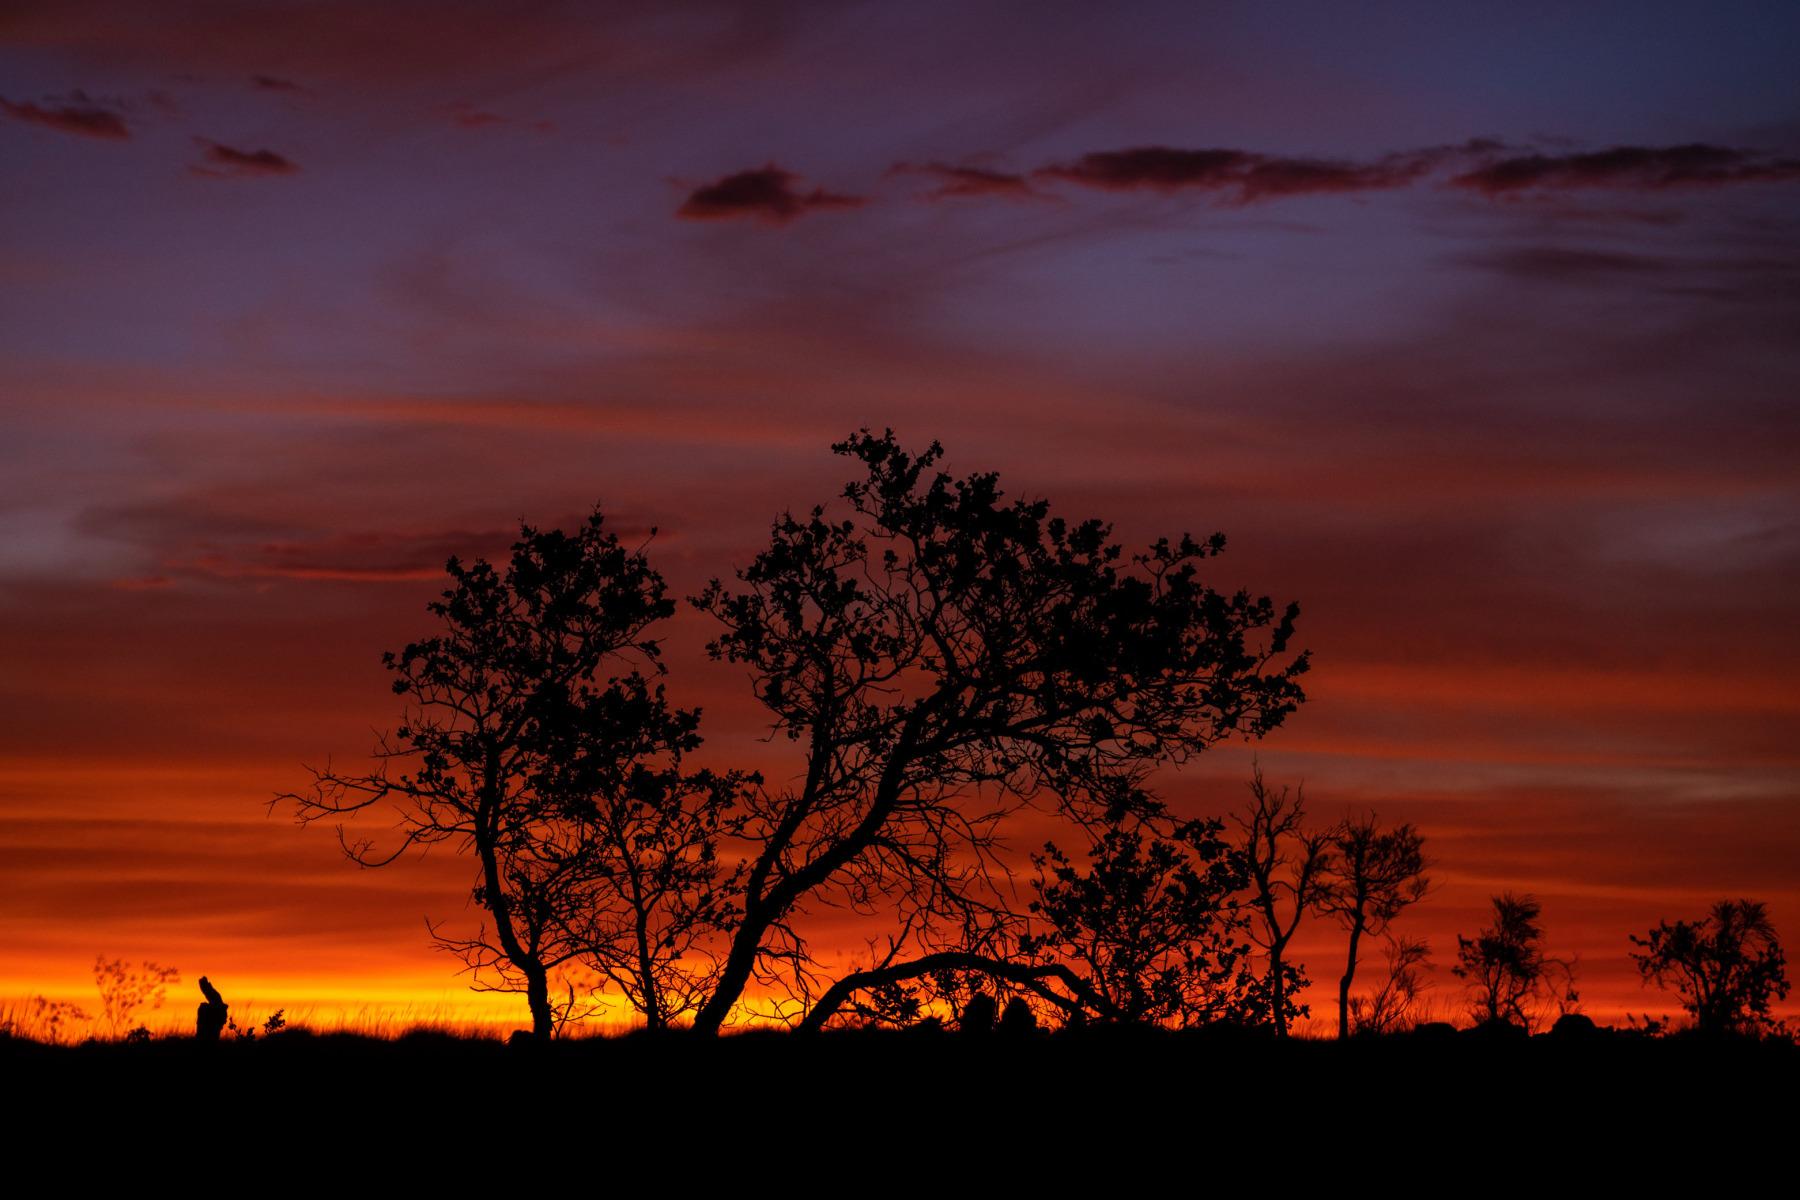 DSC04698_Telfer-Road_nach-Sonnenuntergang